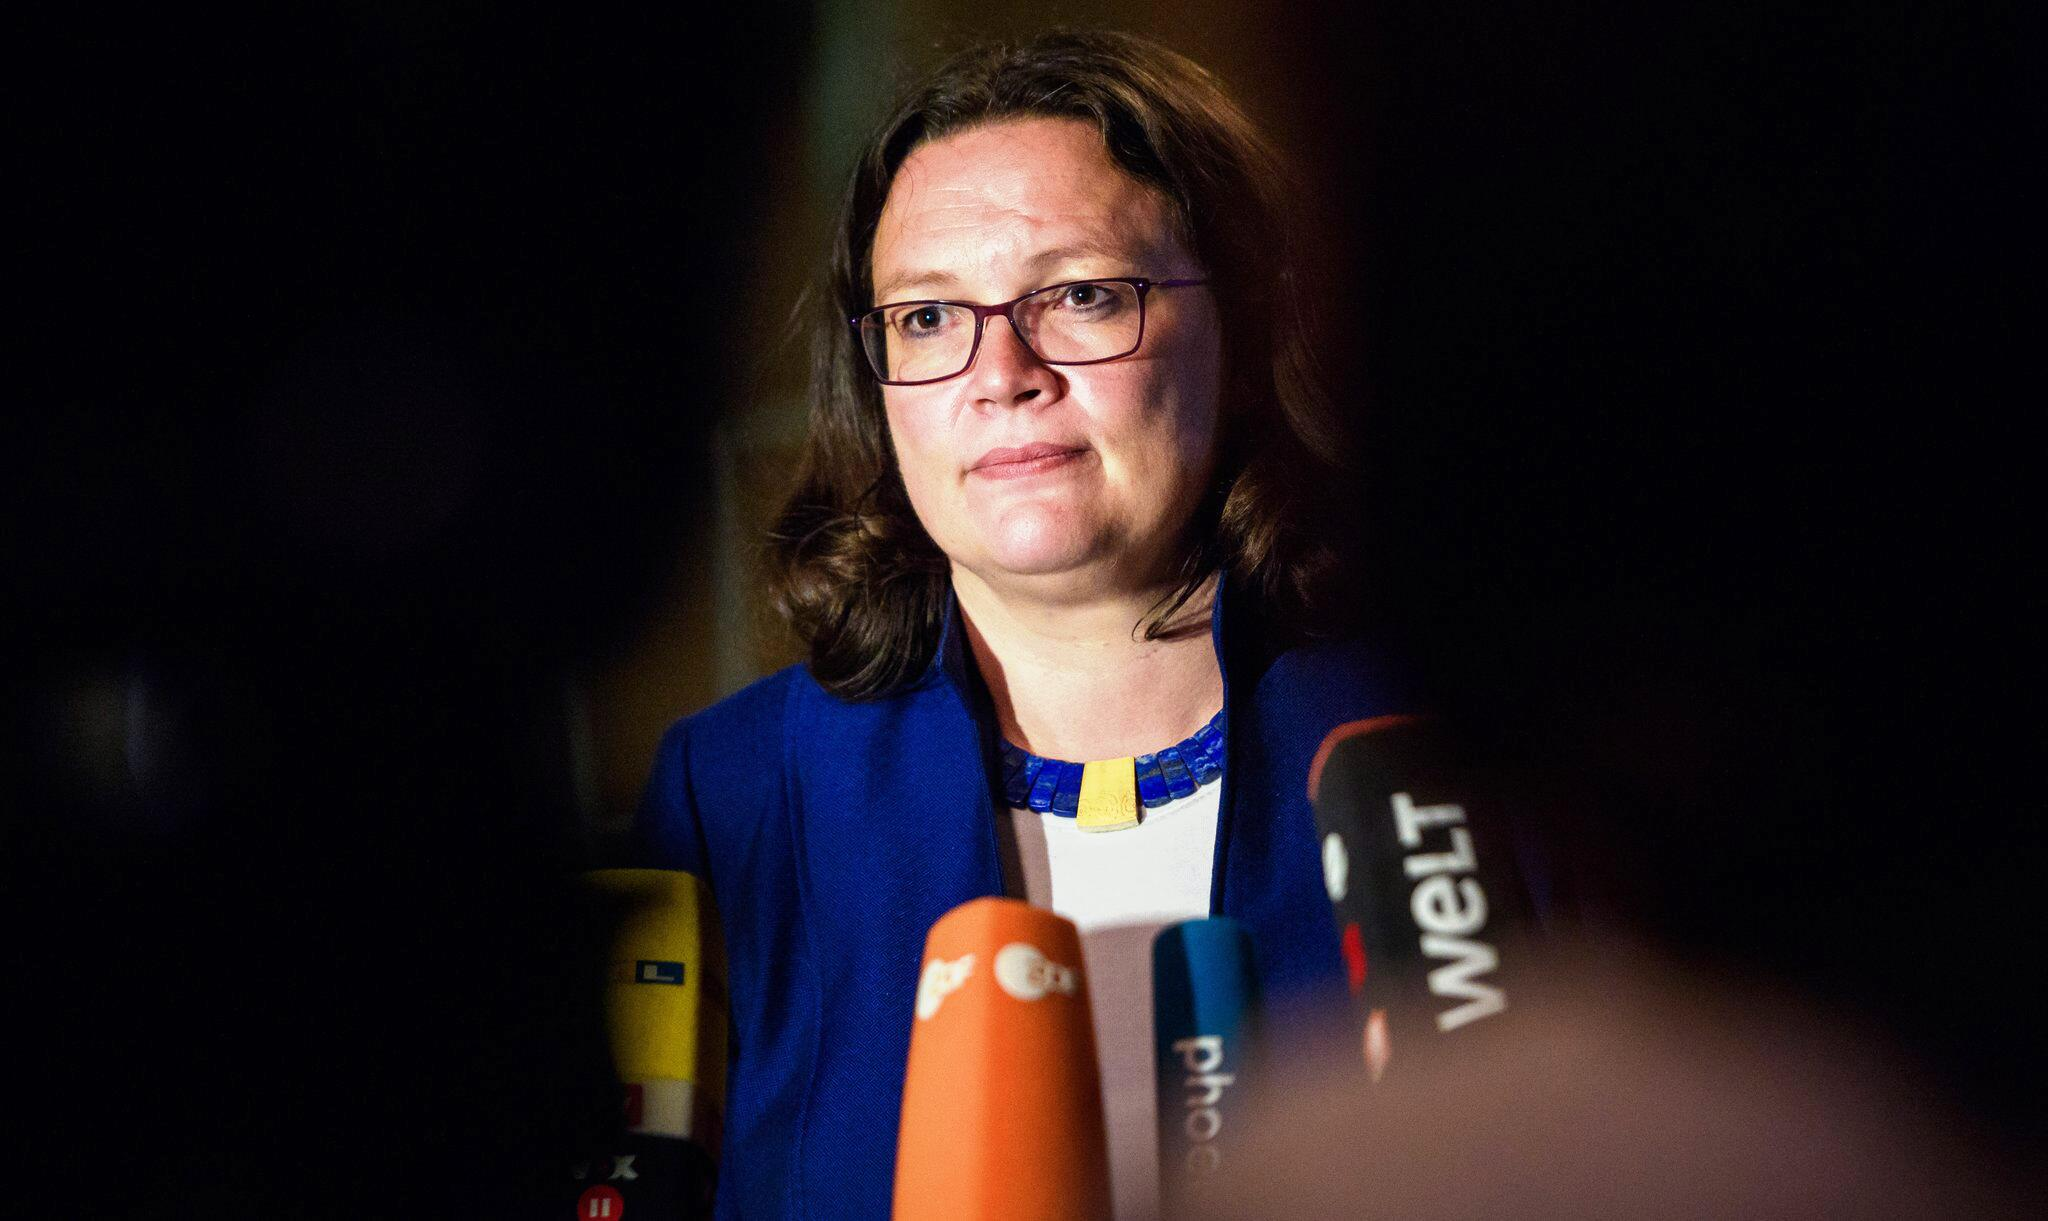 Bild zu SPD, Umfrage, Andrea Nahles